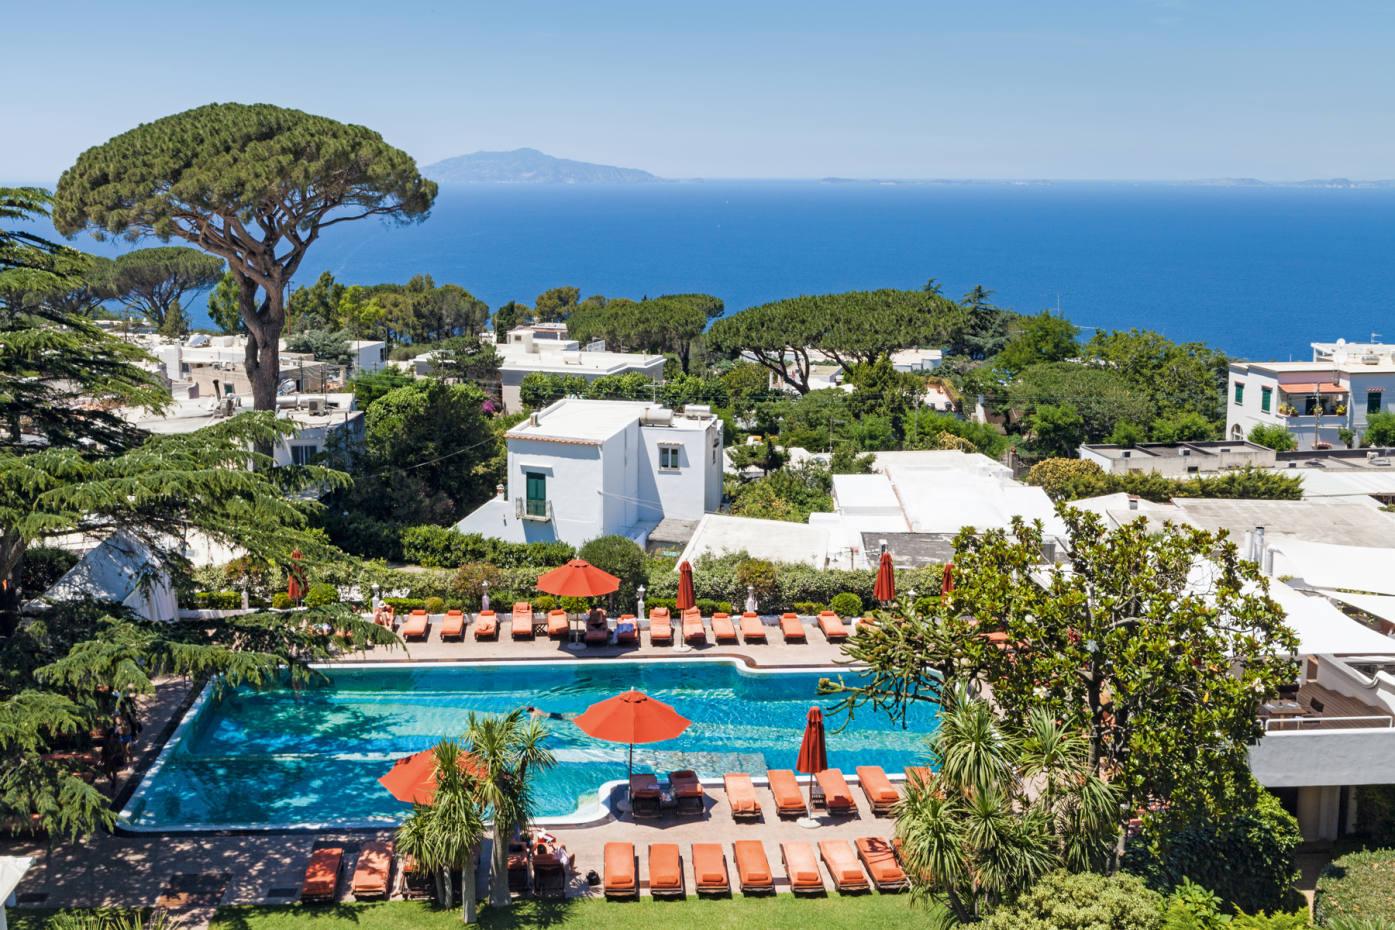 The Capri Palace Hotel in Anacapri overlooks the Amalfi Coast